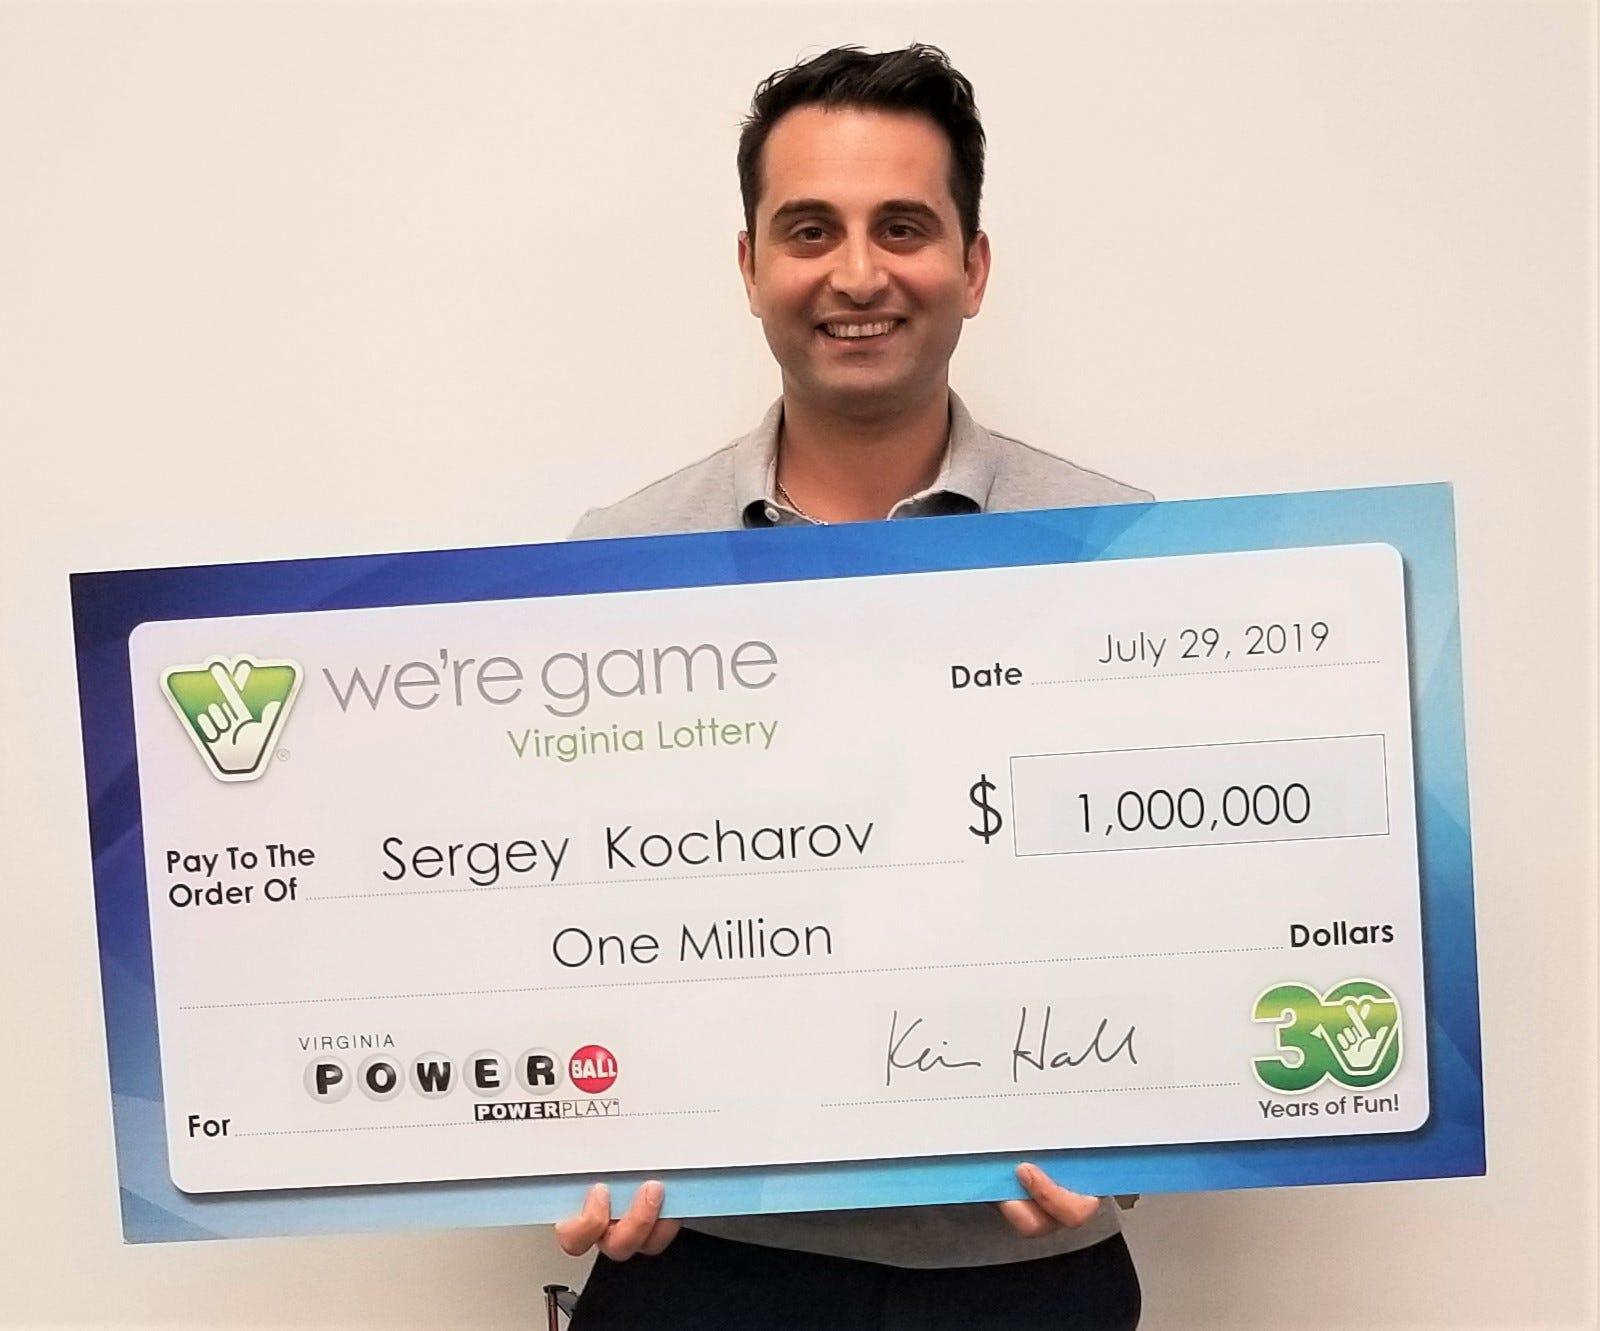 Washington Capitals executive Sergey Kocharov wins $1 million lottery prize